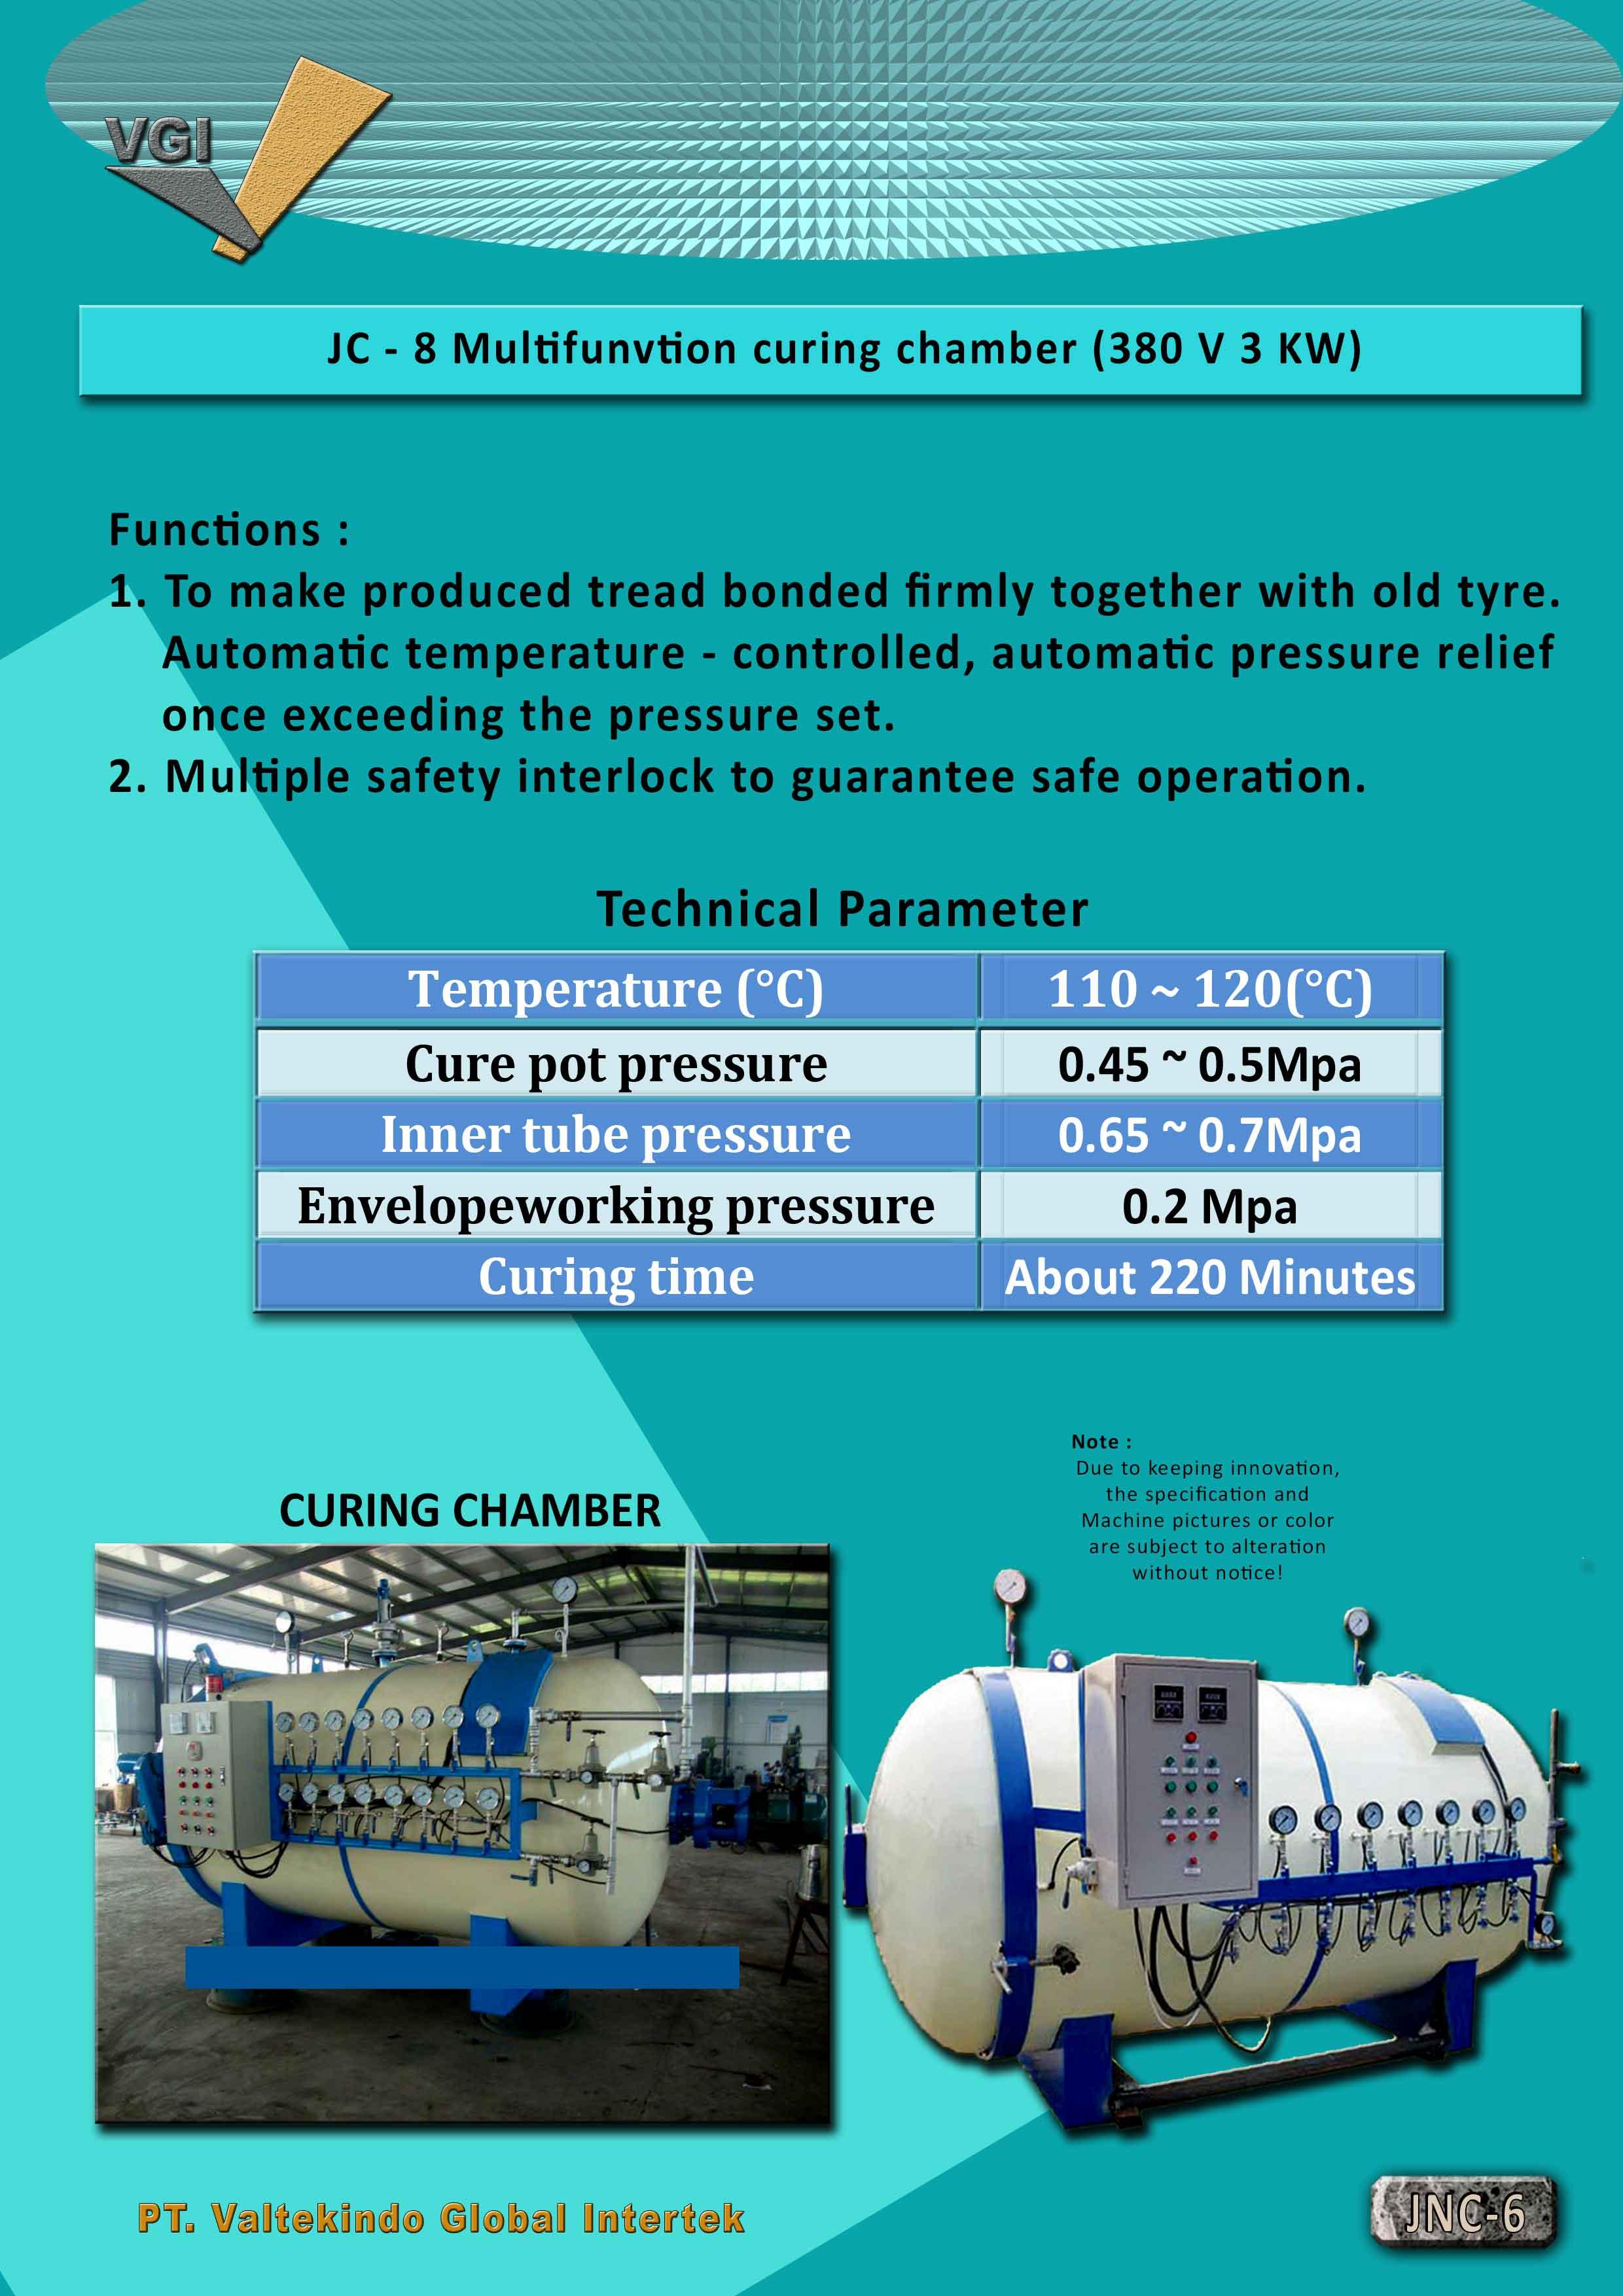 jual mesin Multifanction Curing Chamber Multifanction Curing Chamber